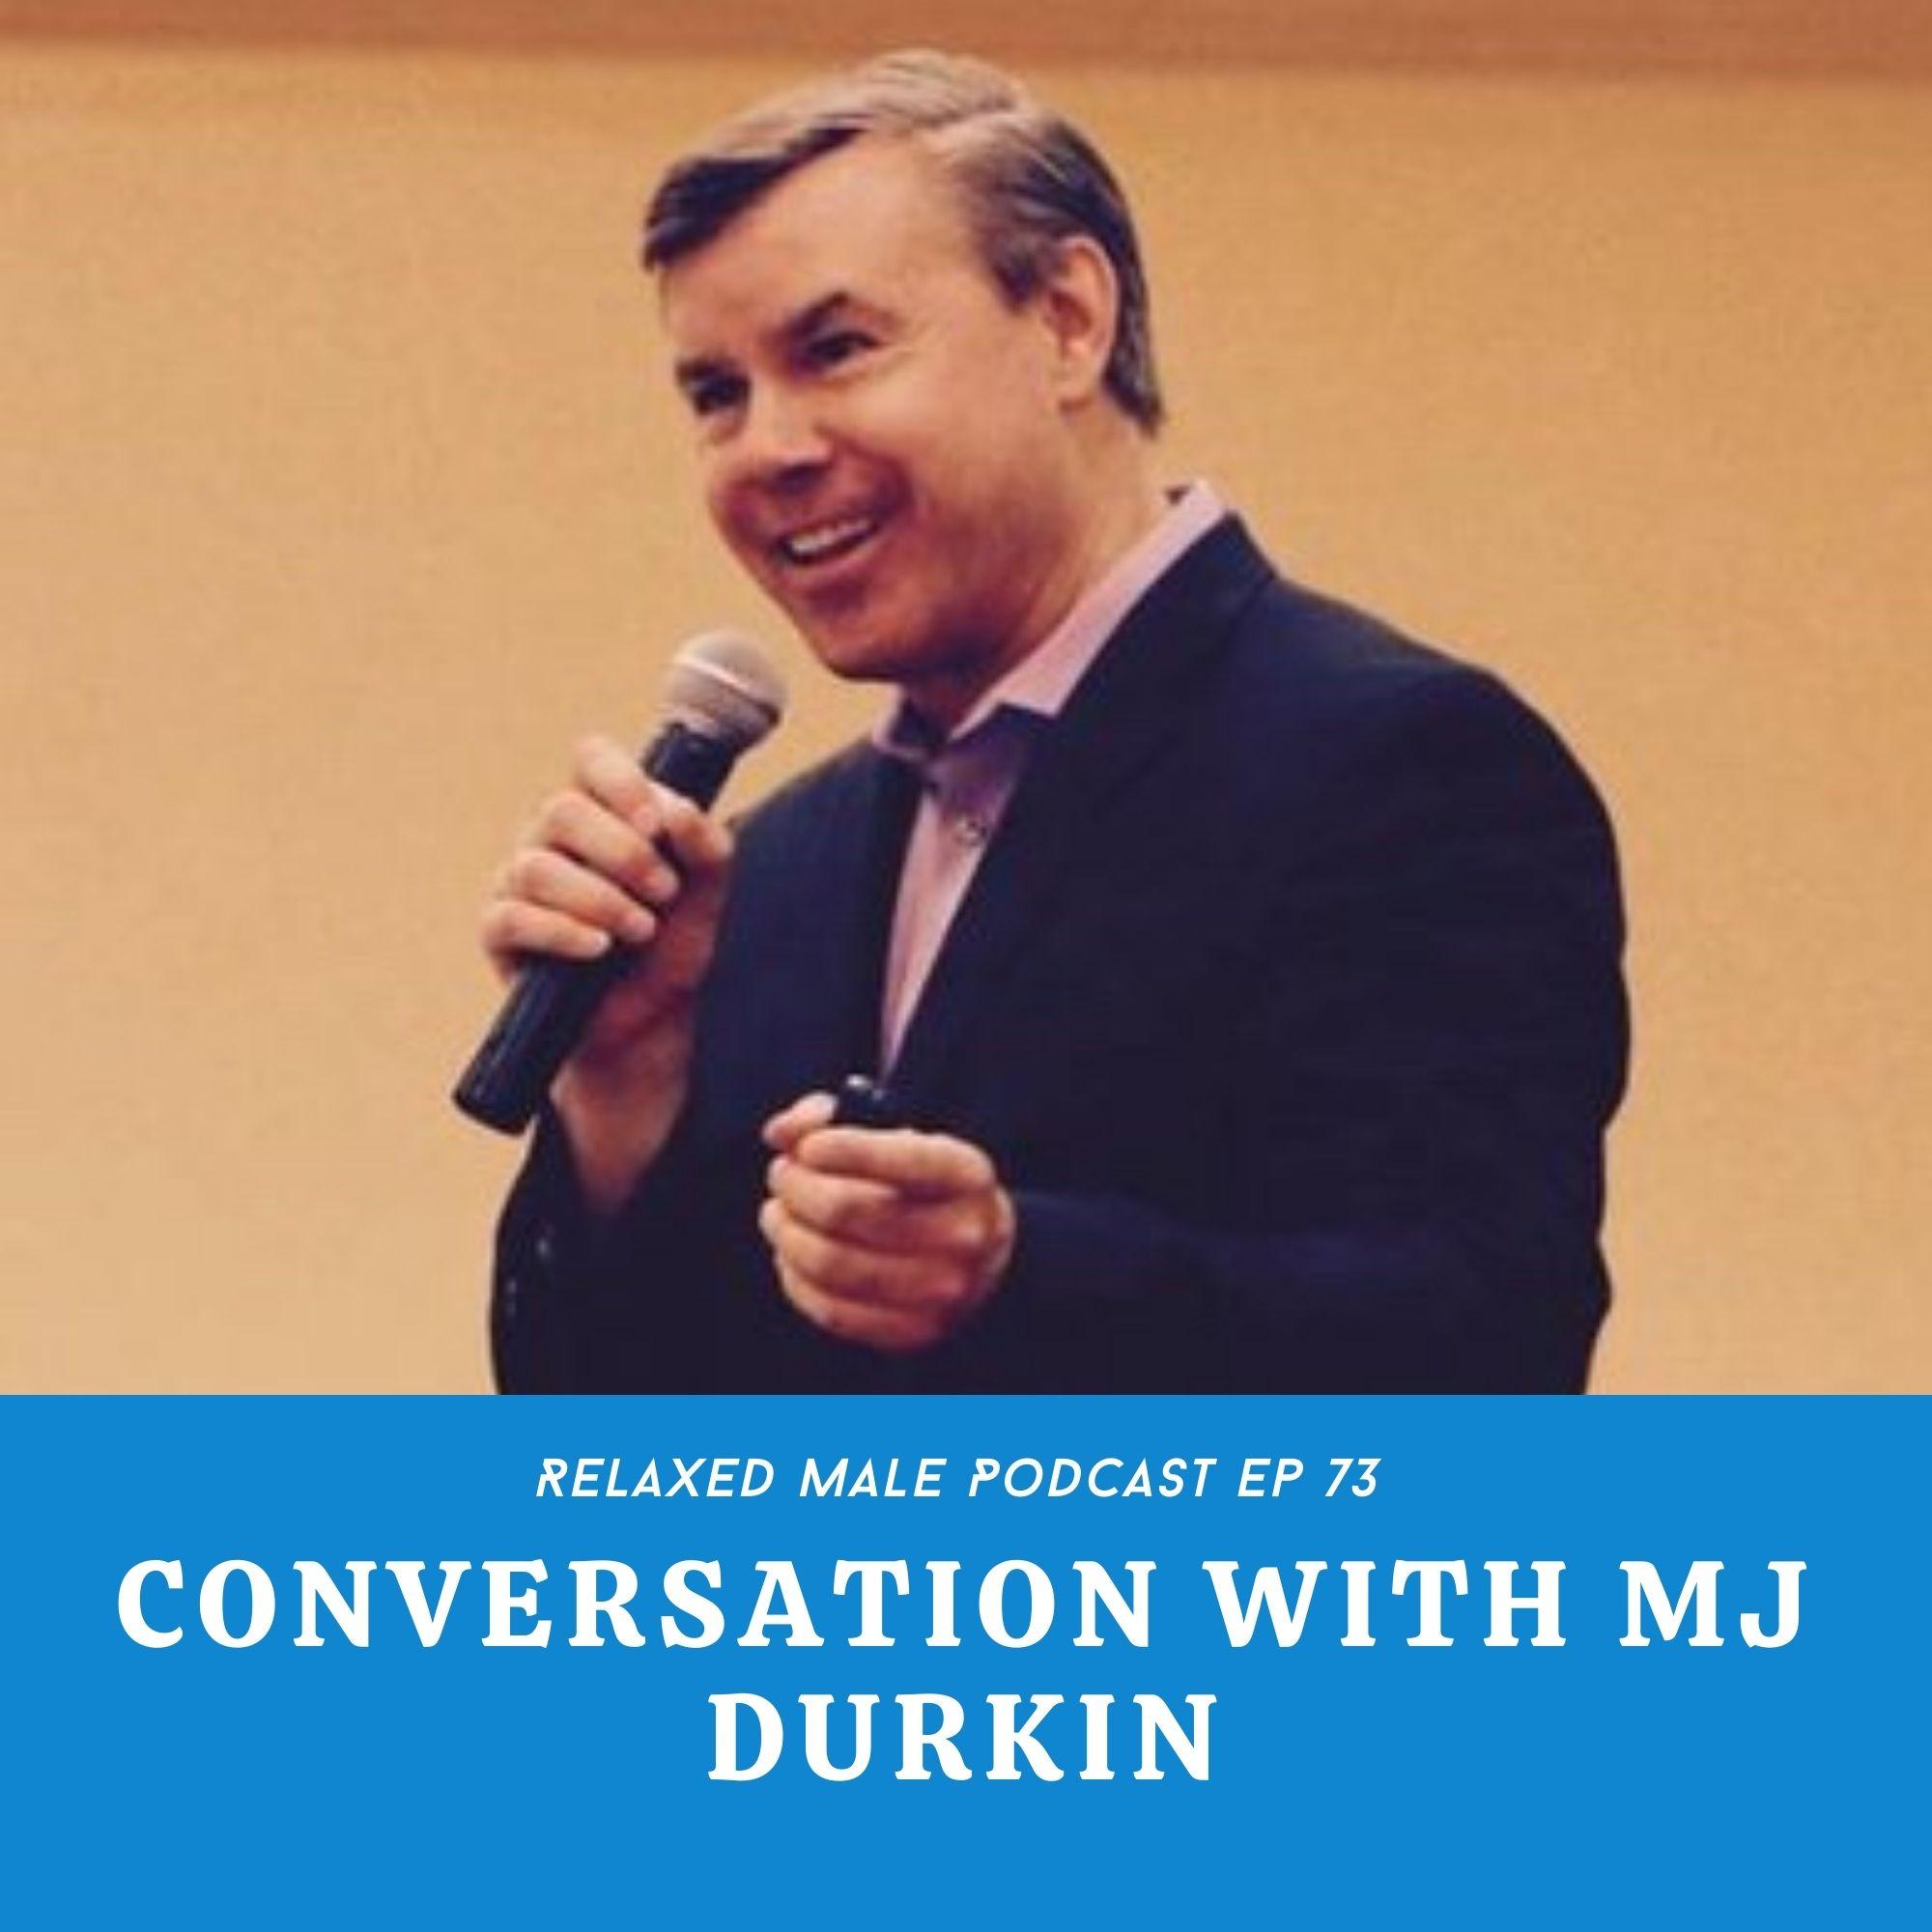 A Conversation with MJ Durkin